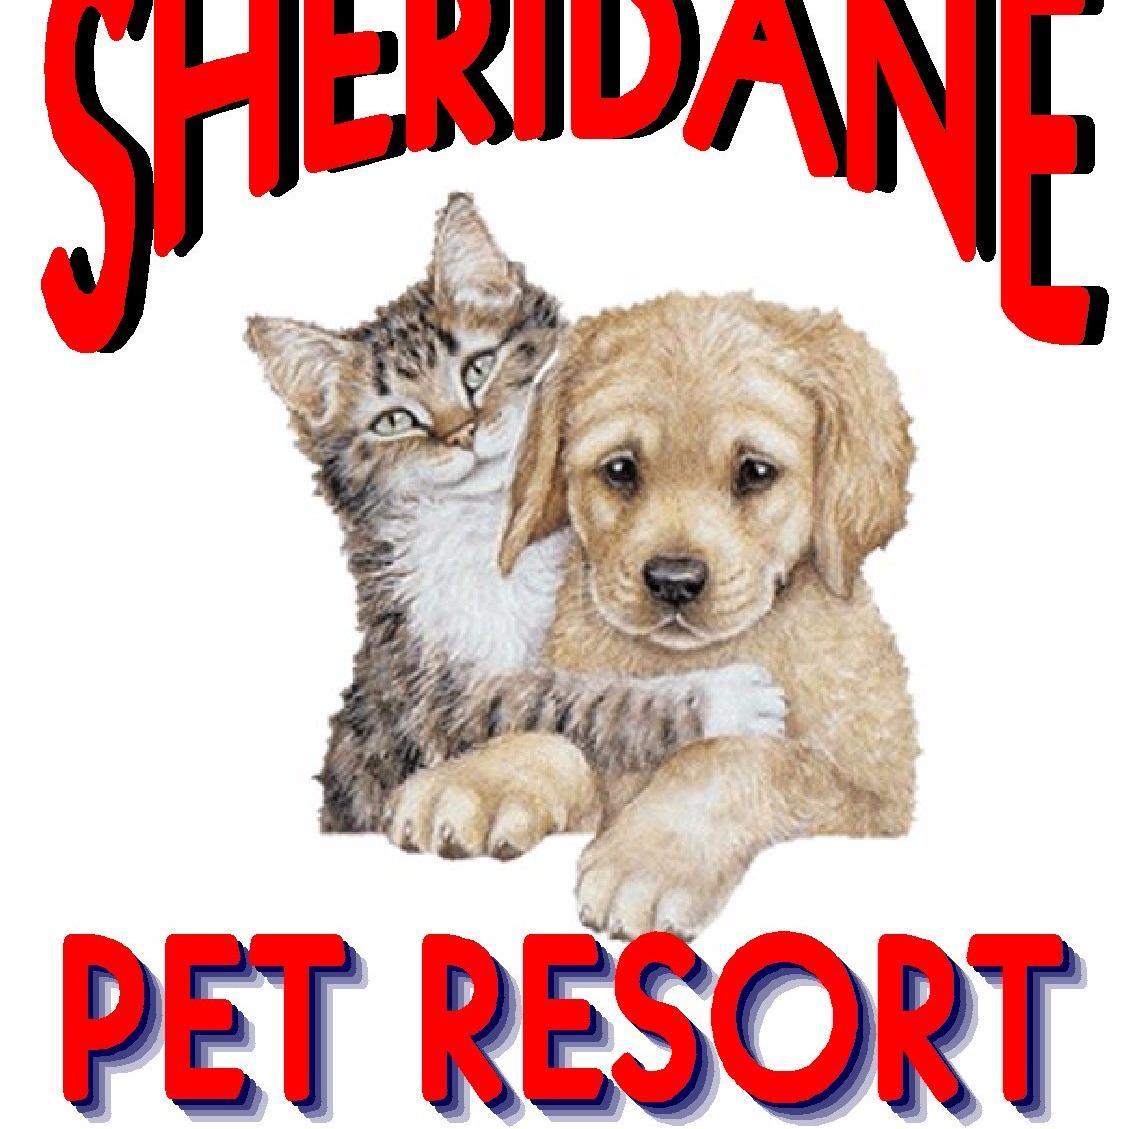 Sheridane Kennels Pet Resort image 1